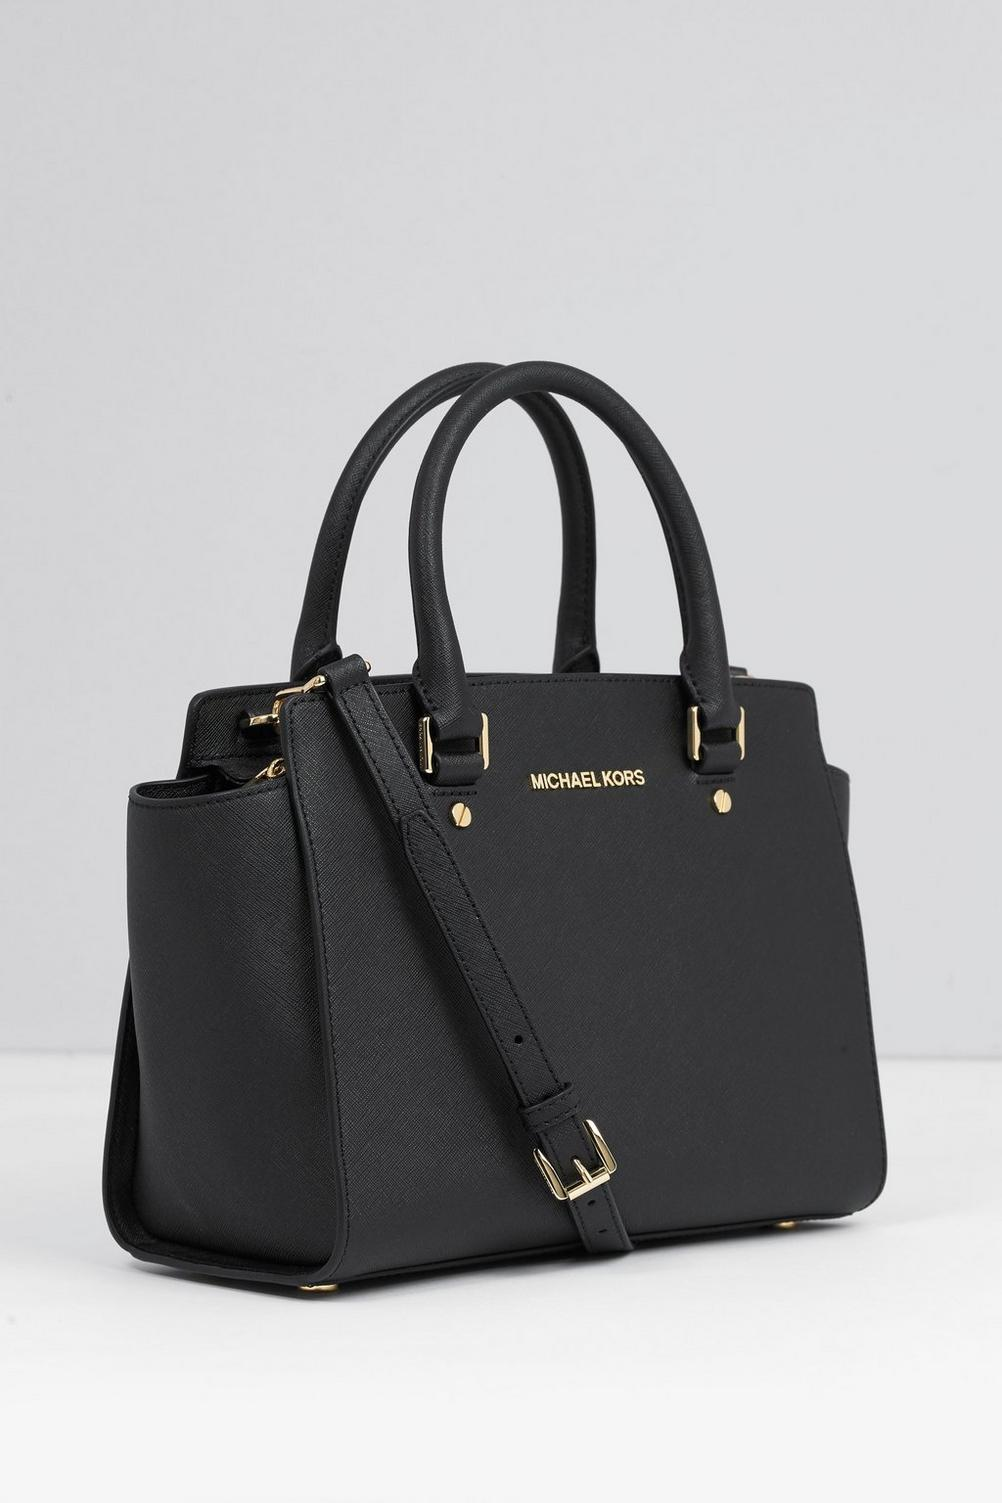 Michael Kors Womens Handbag BEDFORD 35S7GBFS2T ACORN Buy2bee